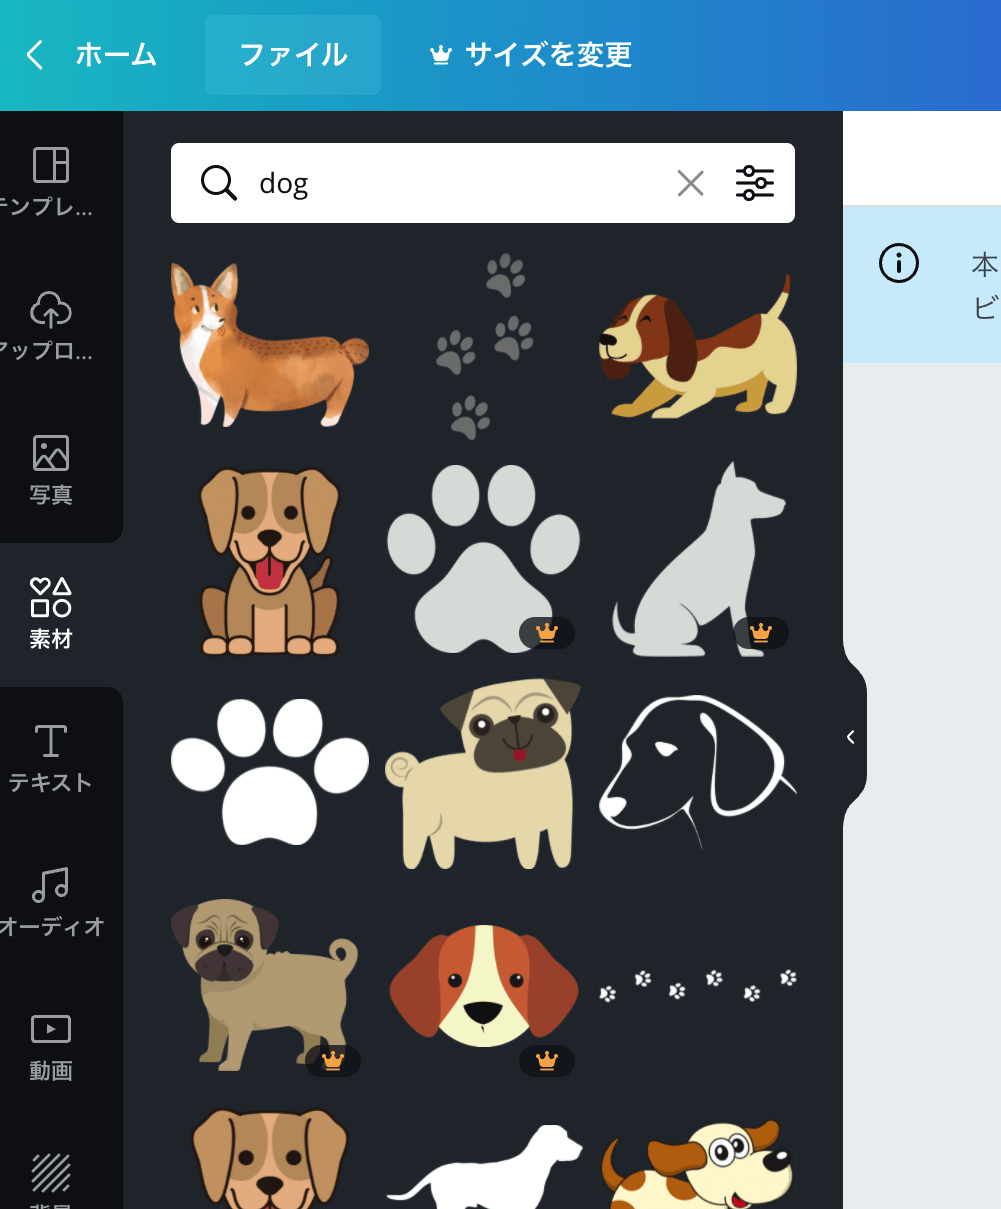 Canvaの「dog」の検索結果